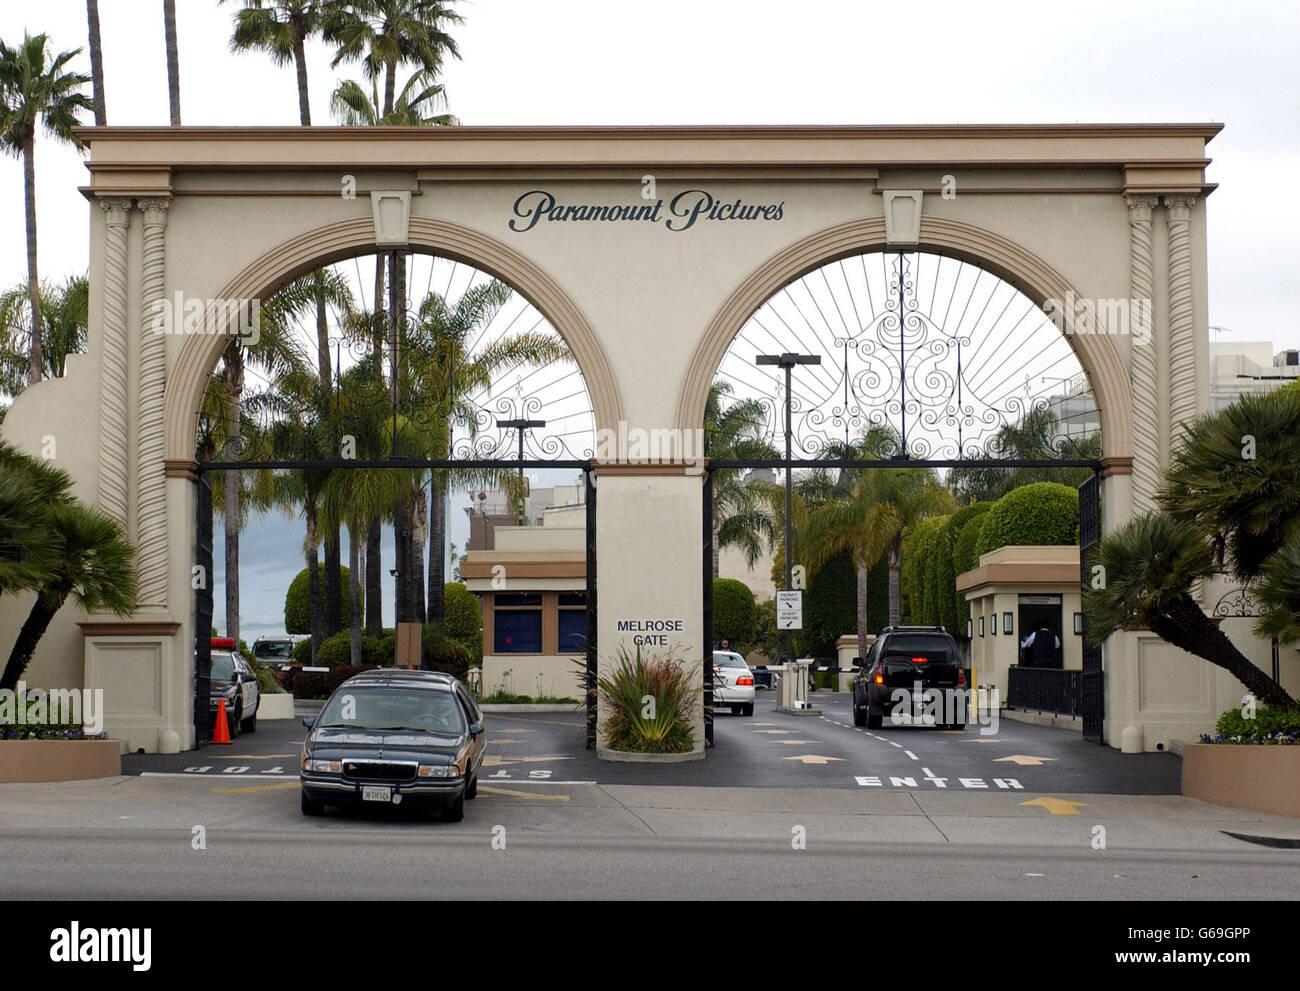 Paramount Studios - Hollywood Stock Photo